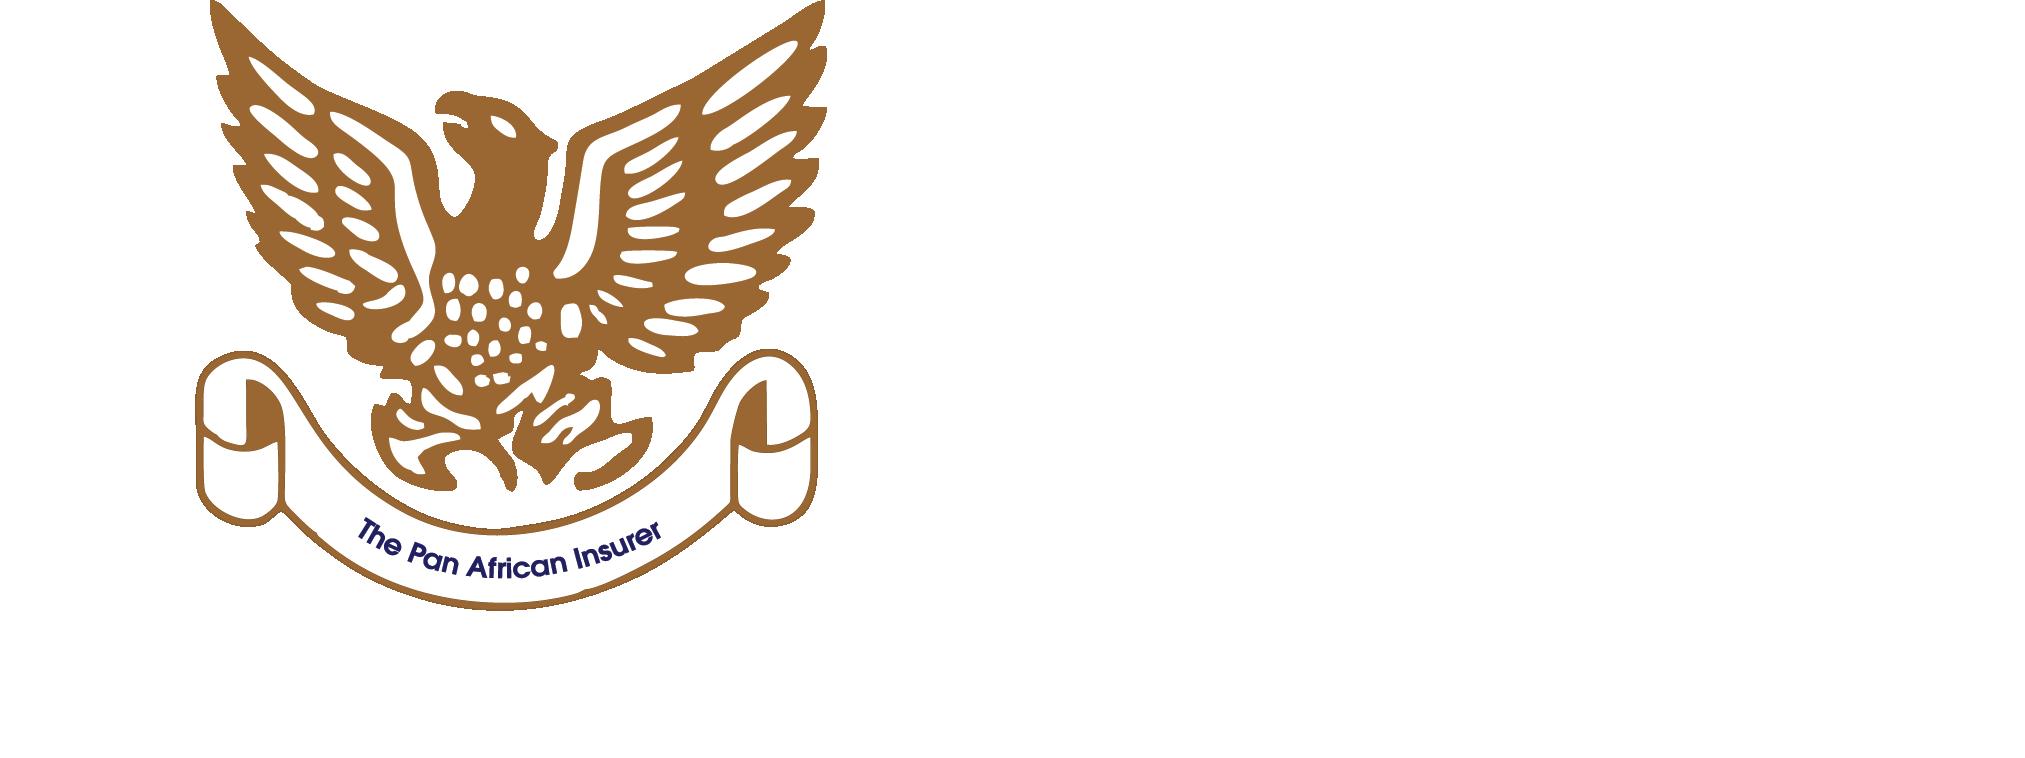 Phoenix of Swaziland